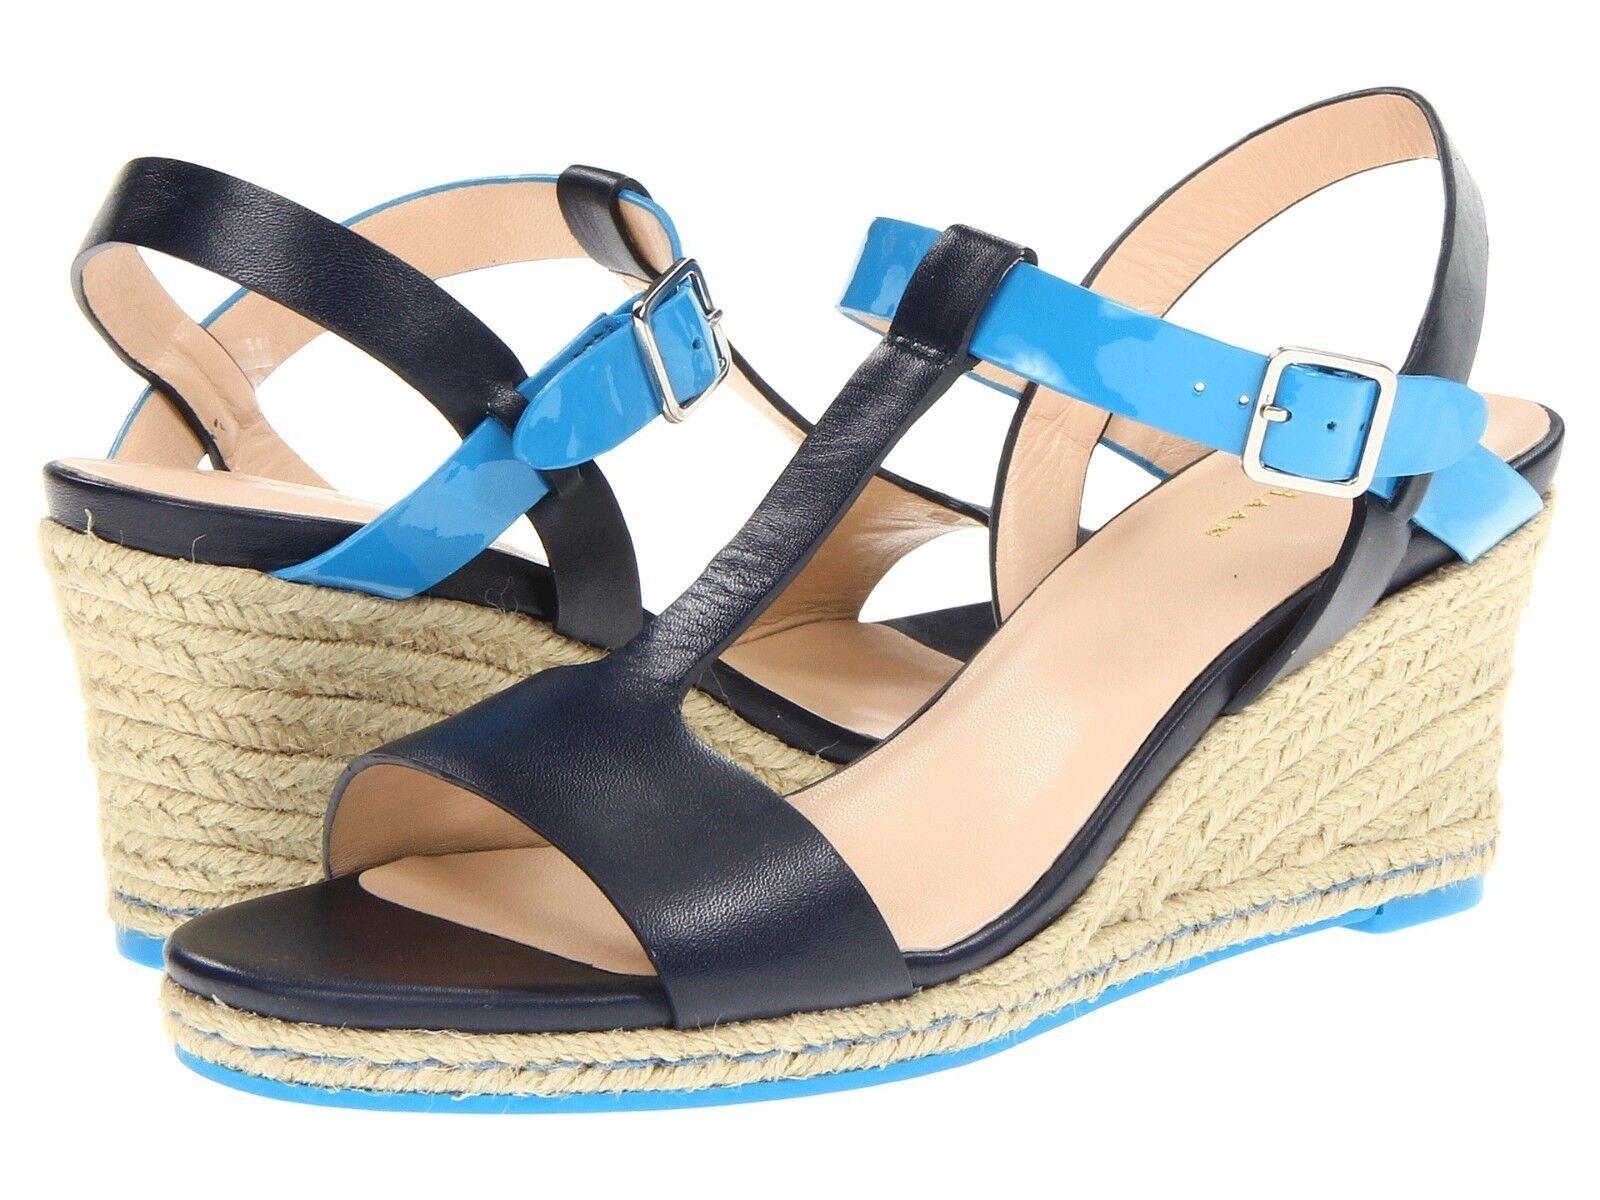 180 Cole Haan Elizabeth Blazer Wedge Sandal shoes Womens 11 NEW IN BOX